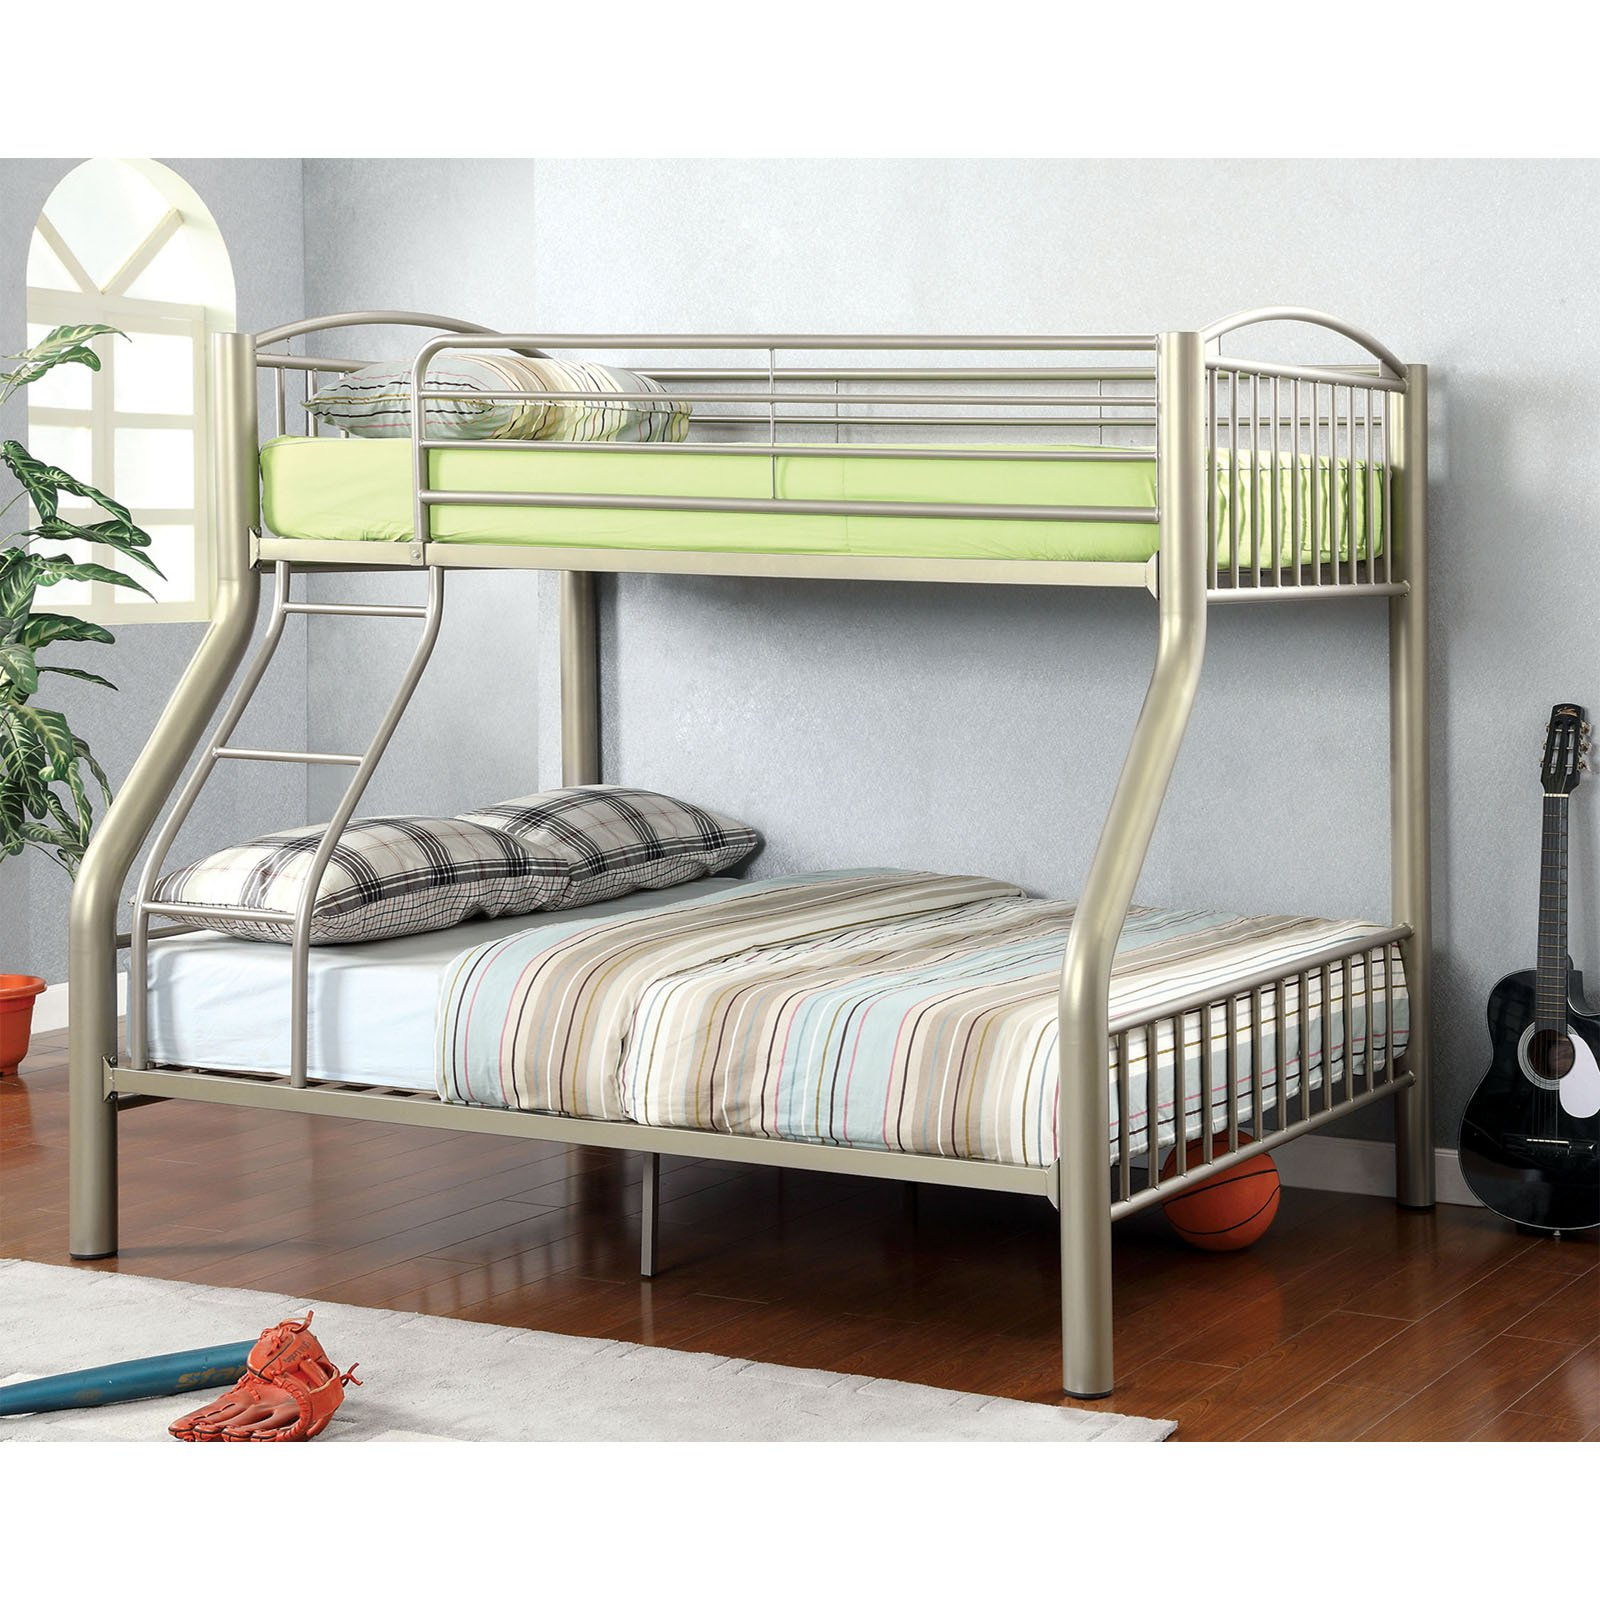 Maverick Made Twin over Full Bunk Bed - Metallic Gold